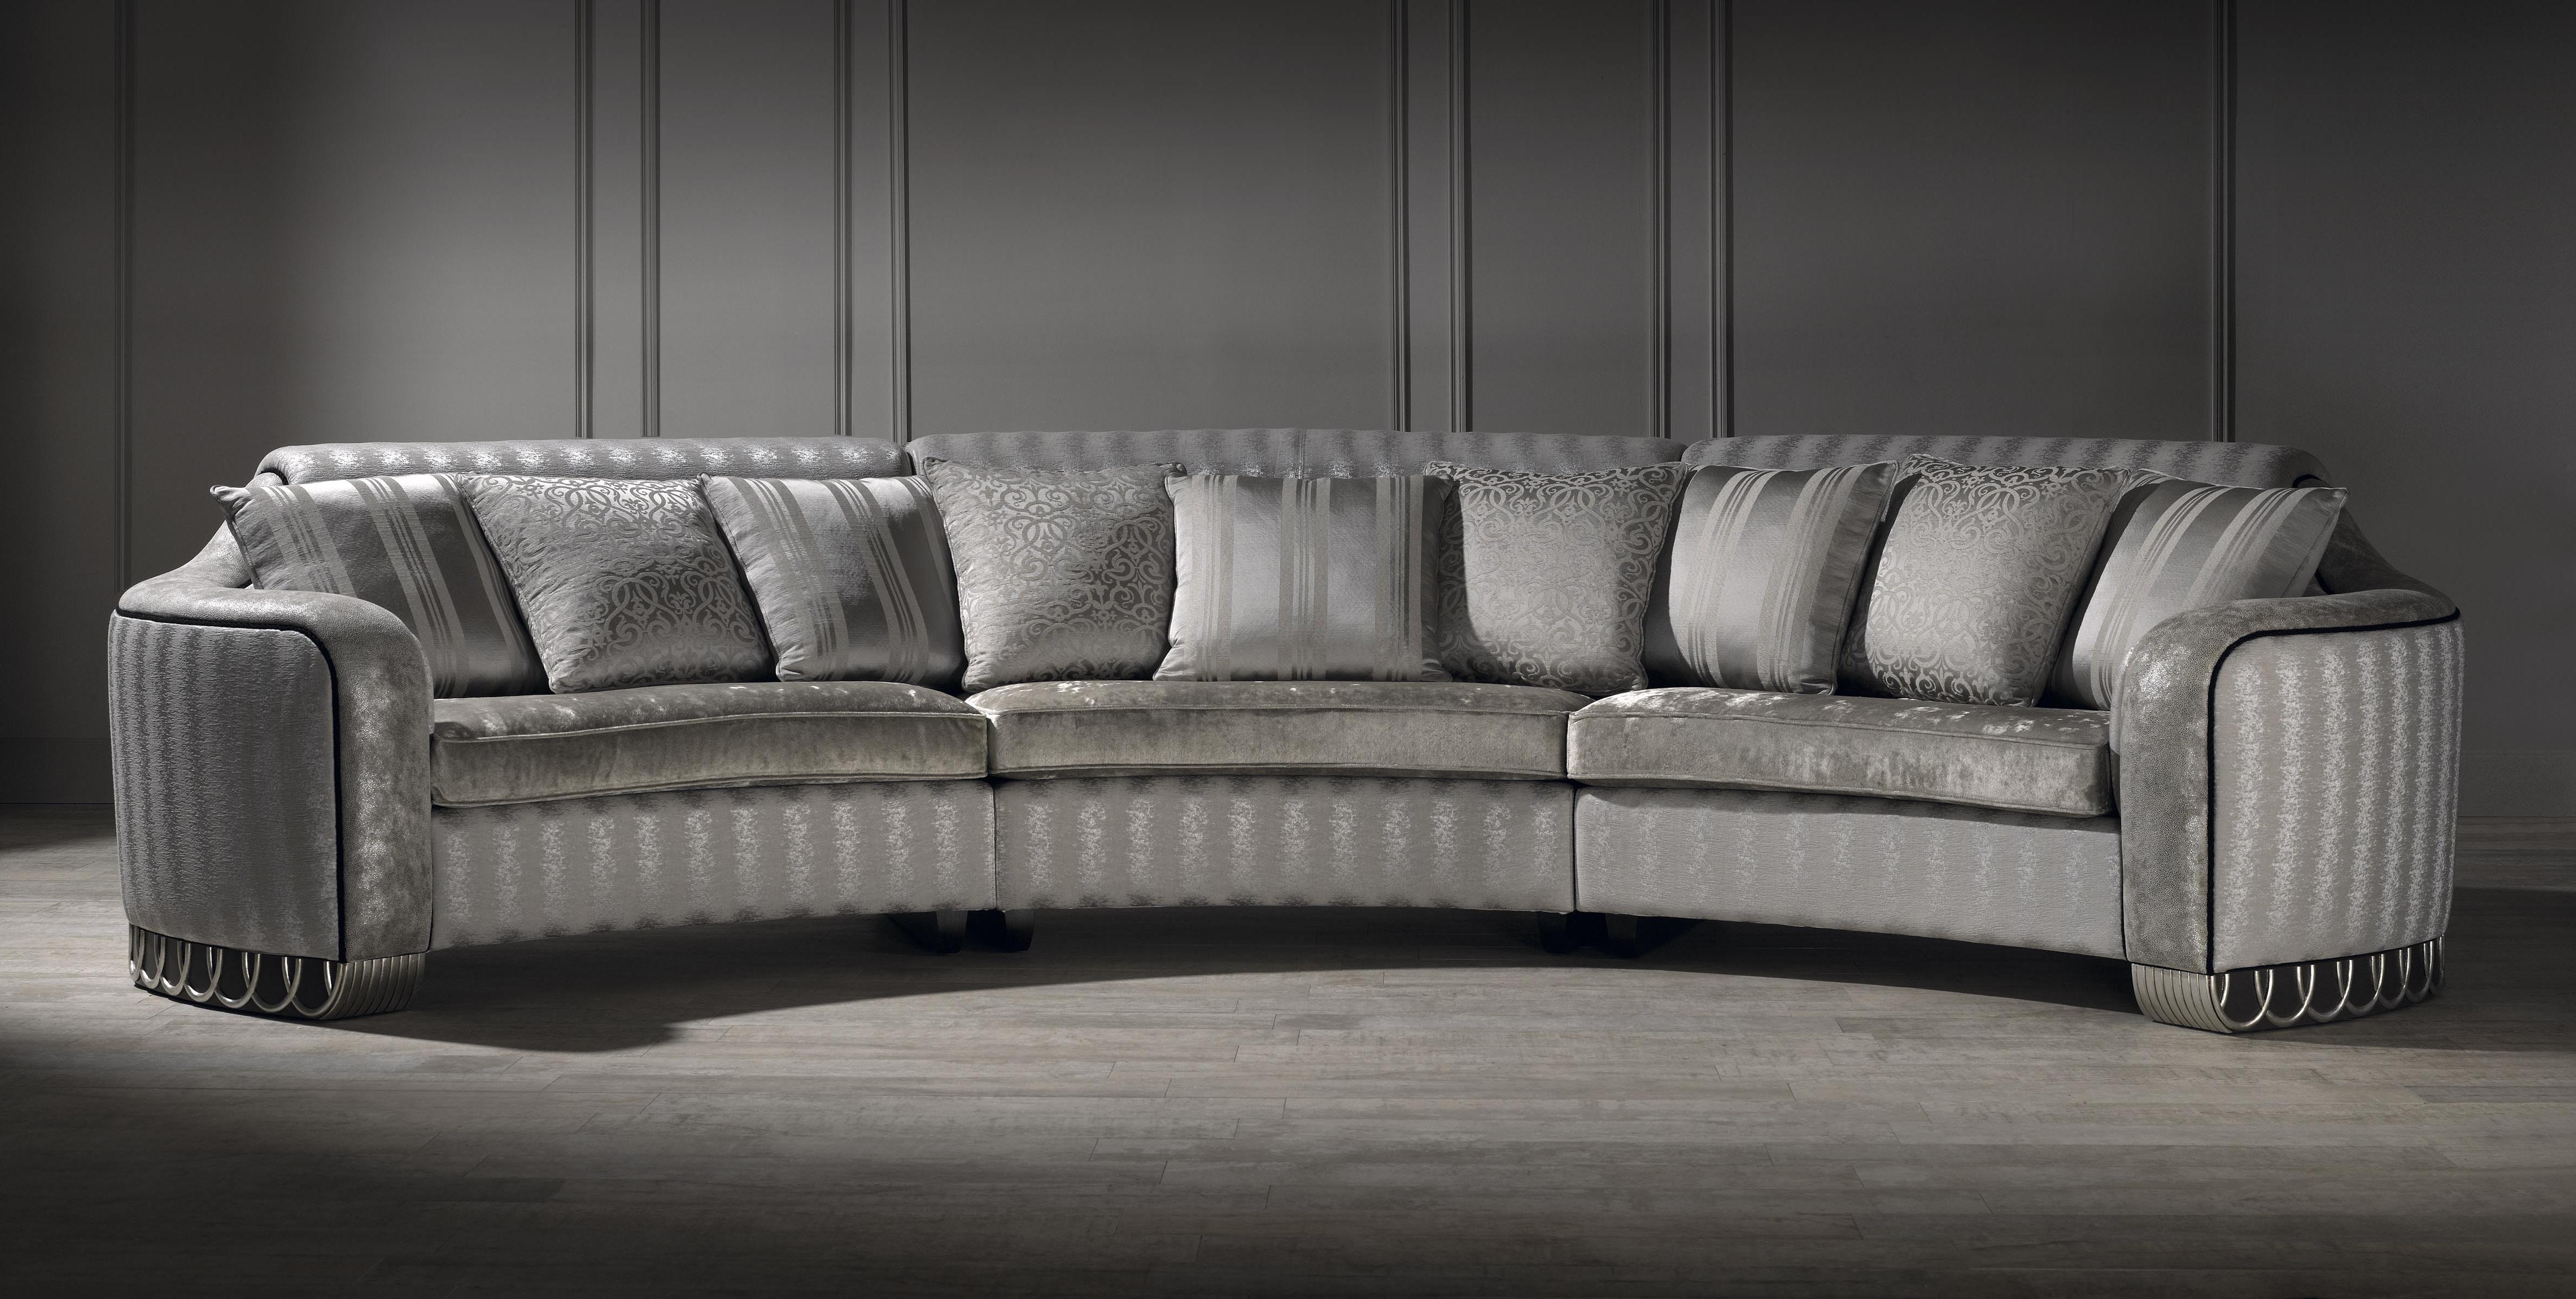 Unusual Sofas Regarding Most Popular Silver Curved Sofa, Luxury Curved Sofa, Unusual Sofa, Large Sofa (View 3 of 15)